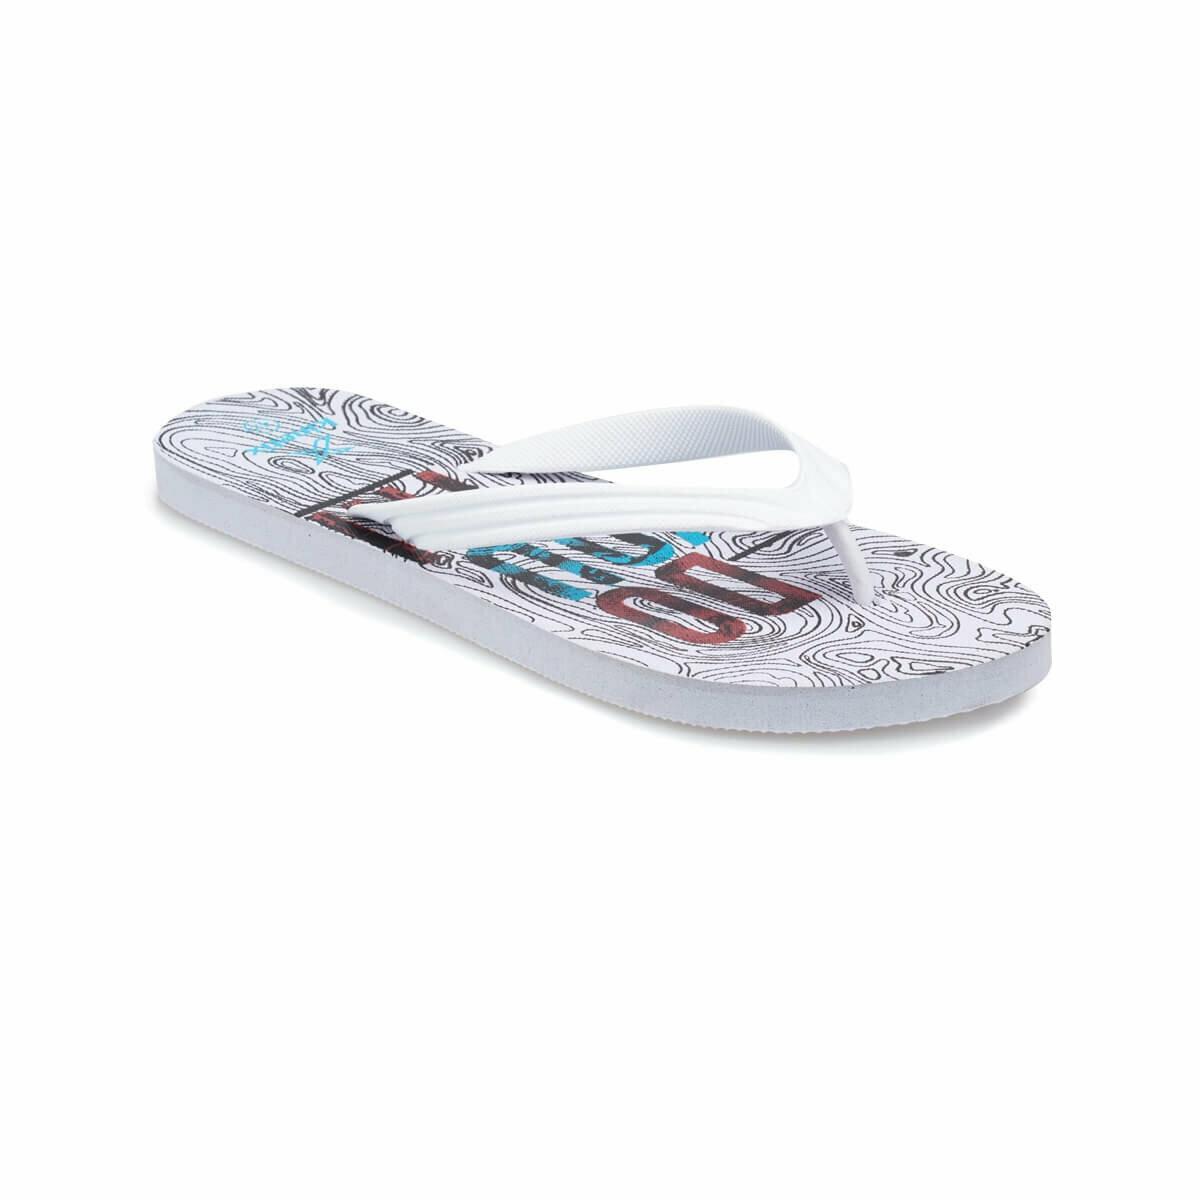 FLO DOYOU White Male Slippers KINETIX